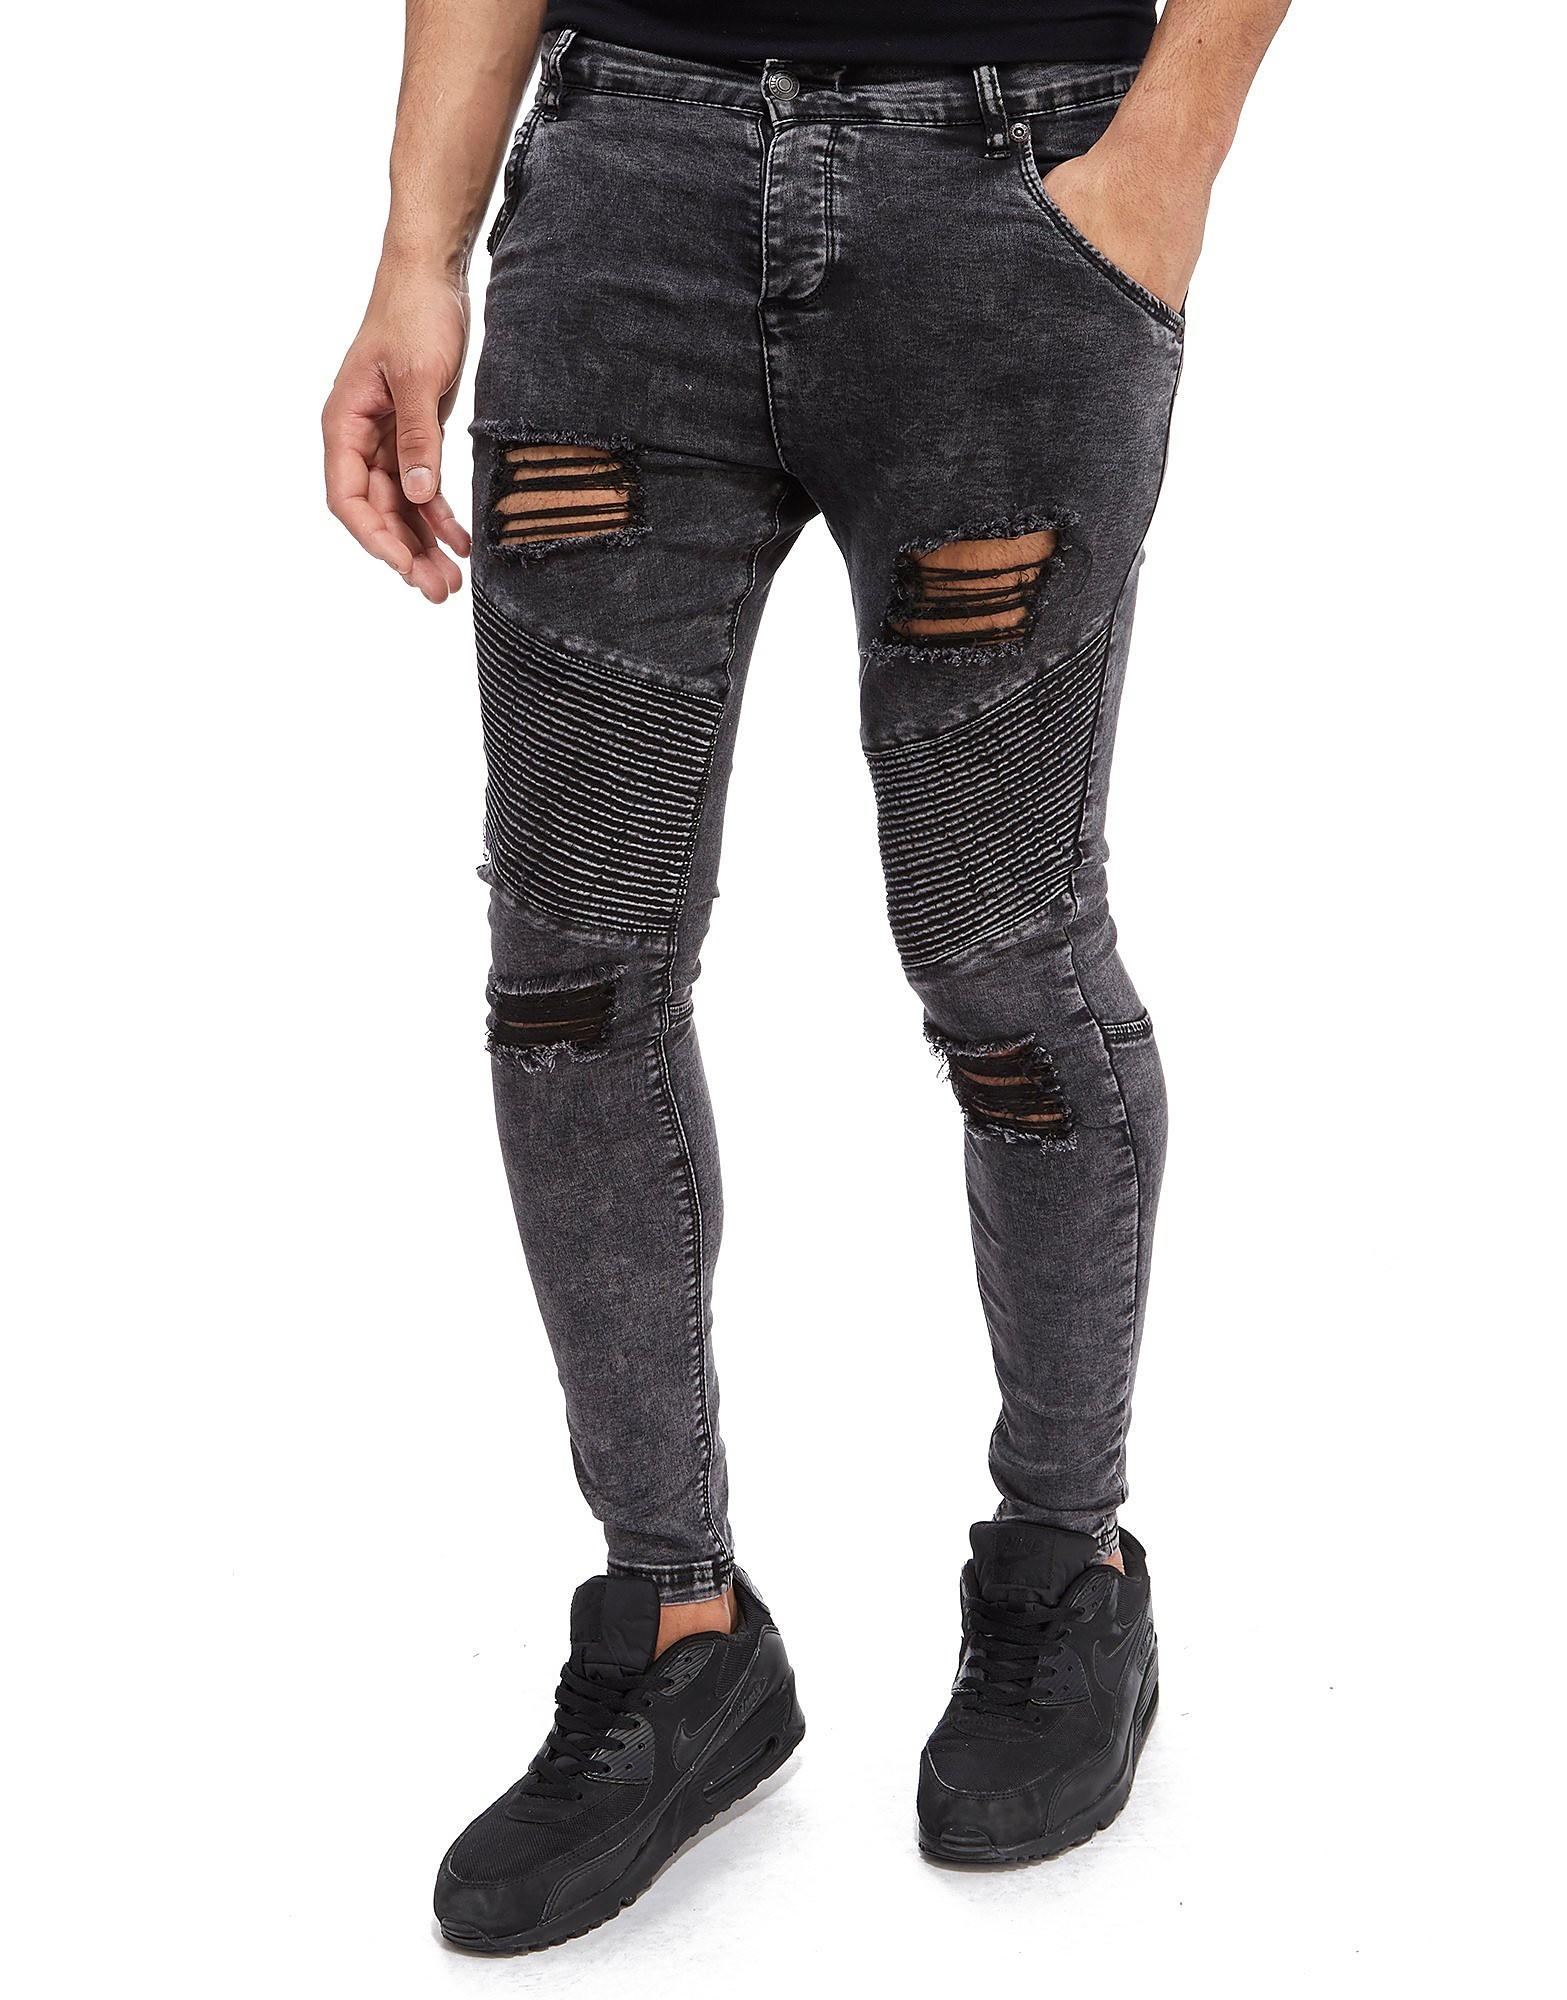 SikSilk Extreme Biker Skinny Jeans